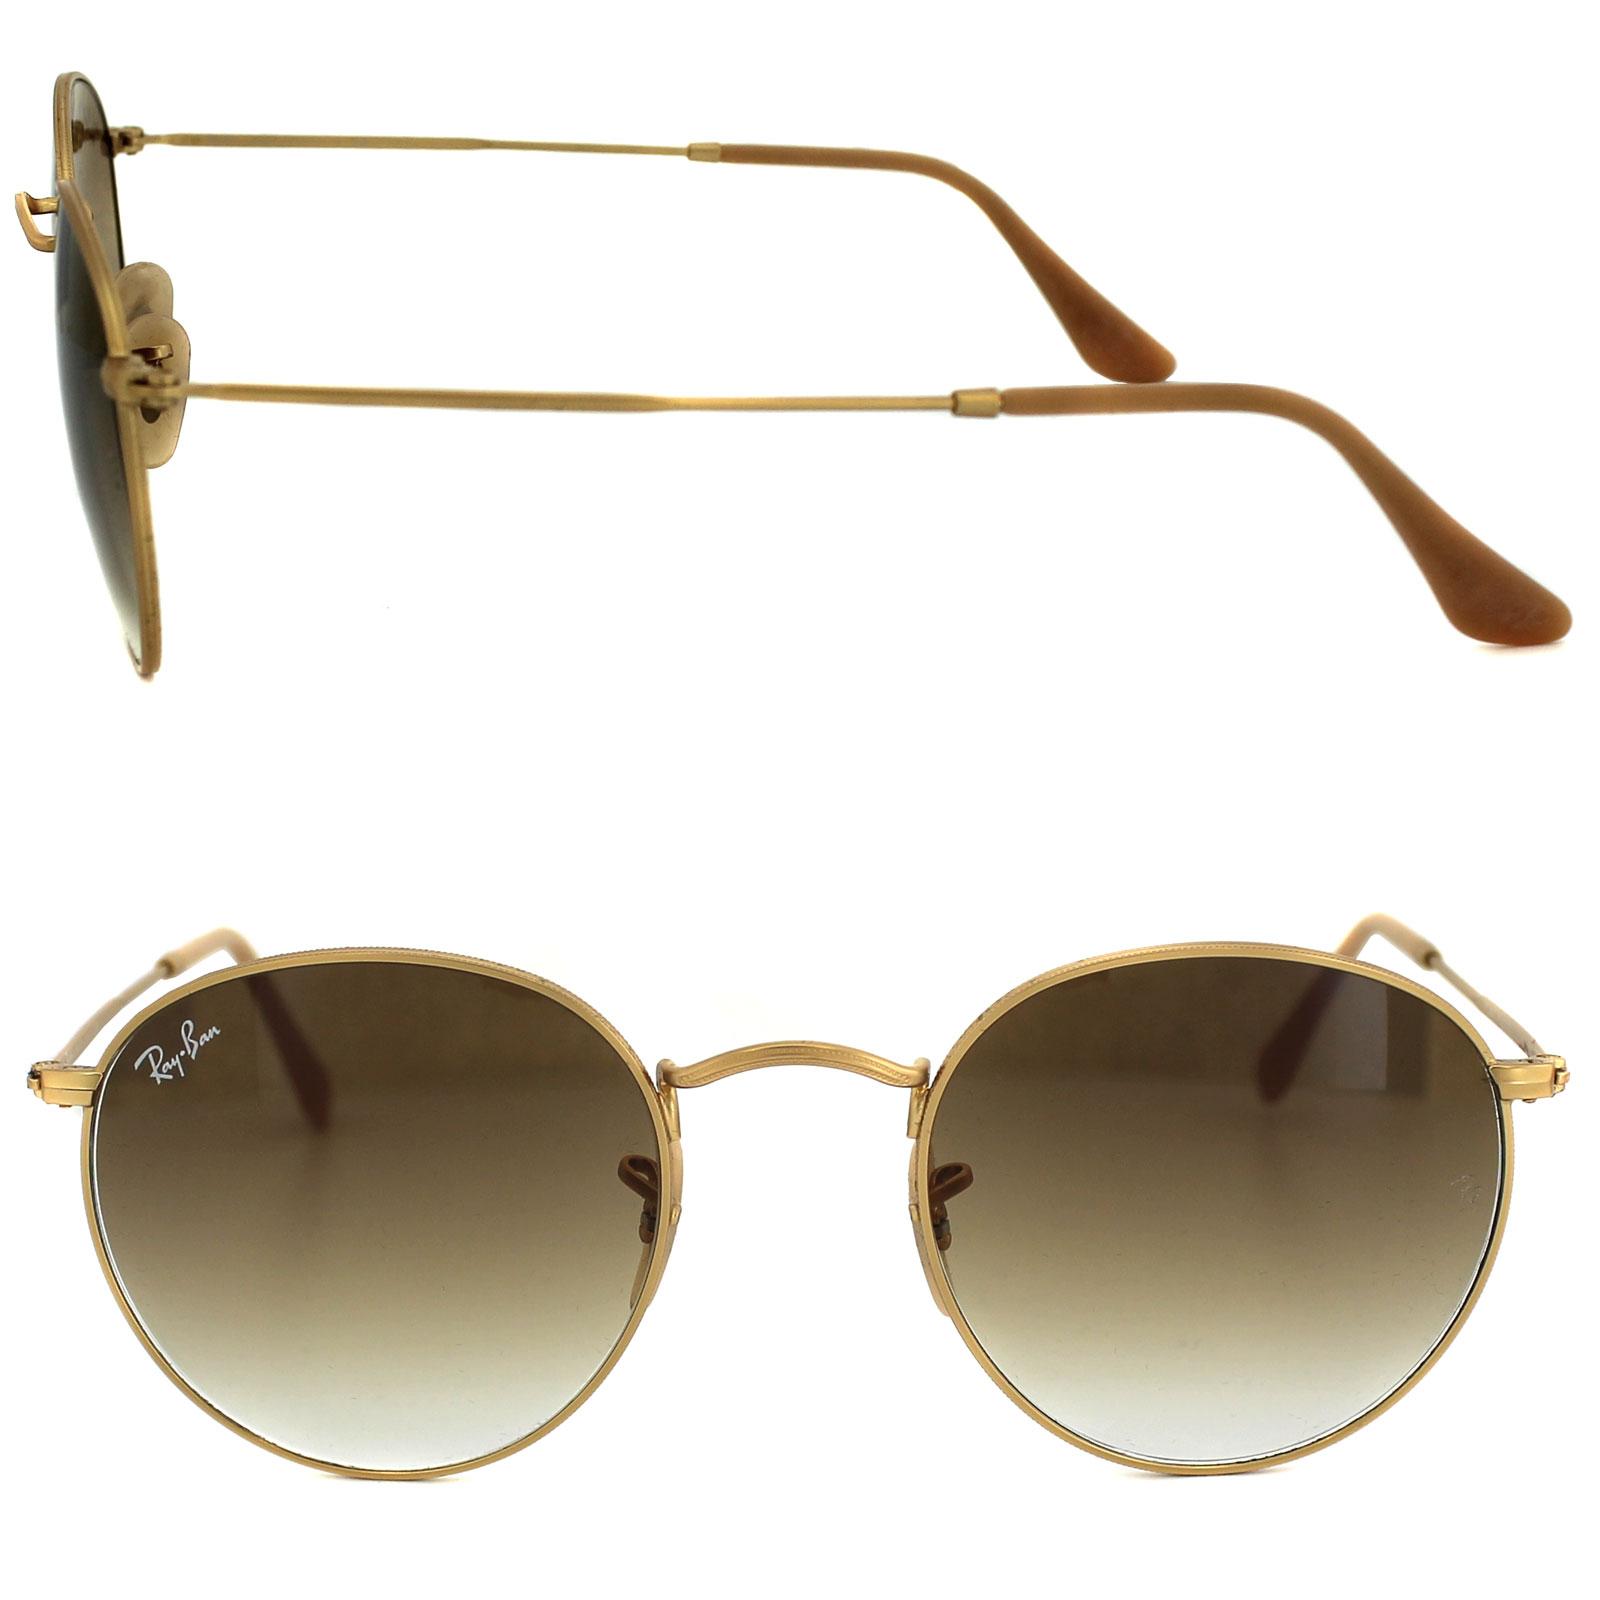 7ae09eaa3b Sentinel Ray-Ban Sunglasses Round Metal 3447 112 51 Gold Light Brown  Gradient